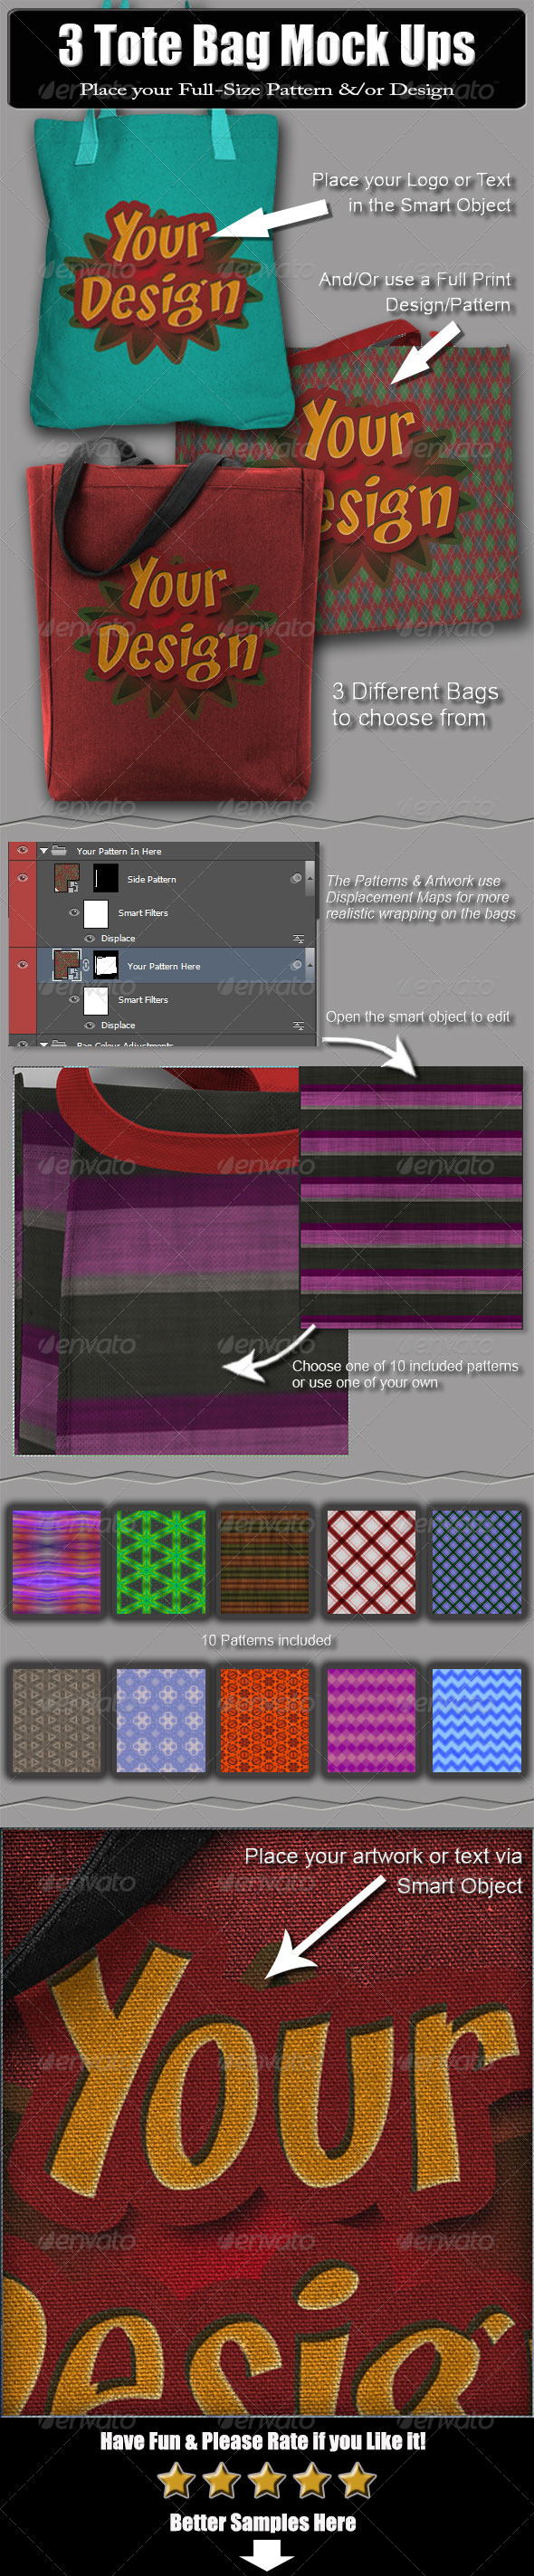 GraphicRiver 3 Tote Bag Mock Ups 6533321